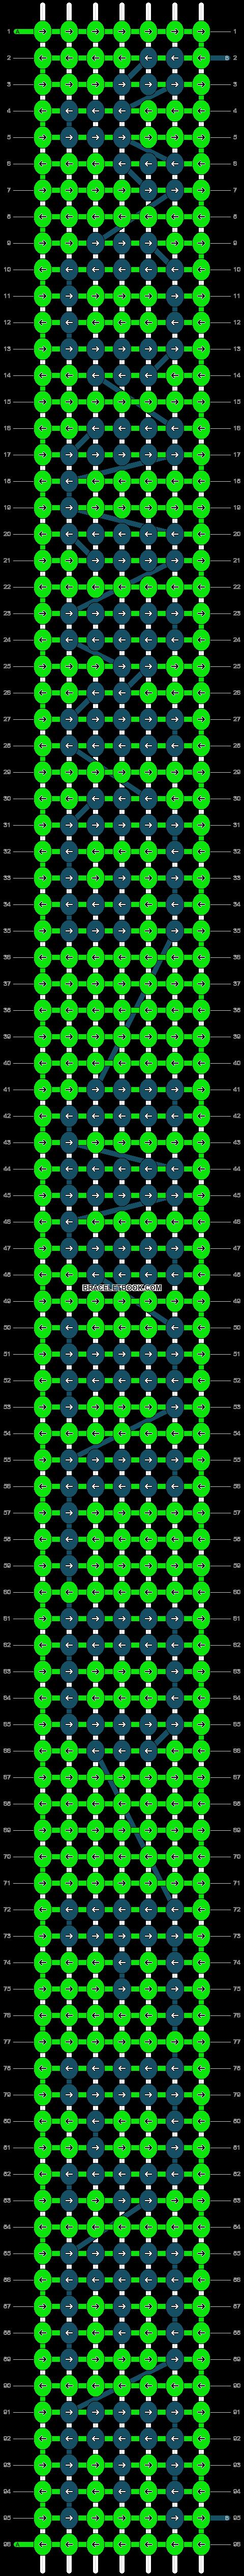 Alpha pattern #4815 pattern